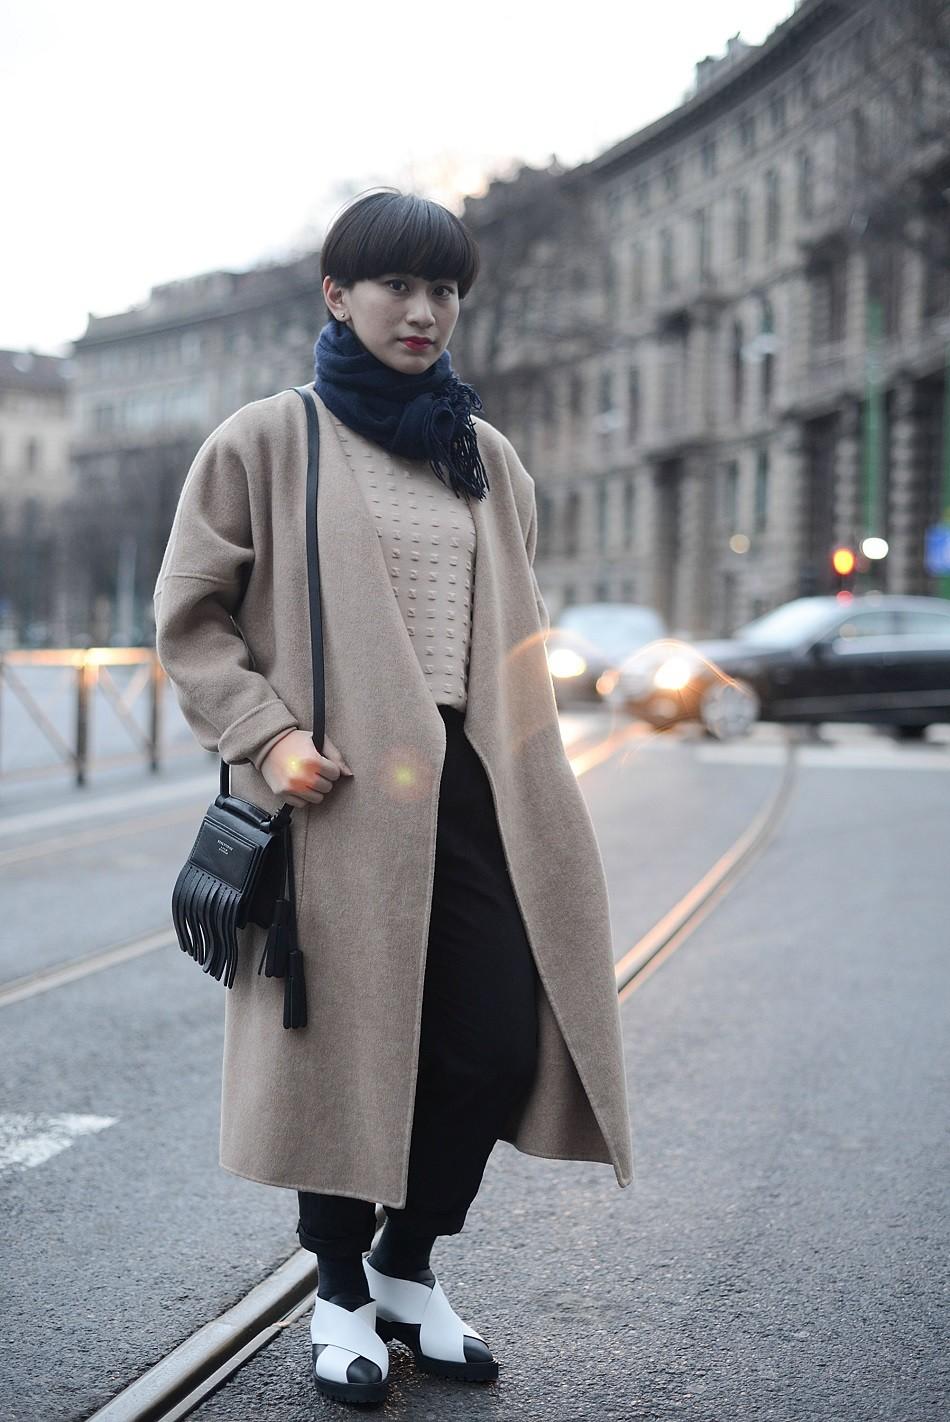 Ayu Ananto poses wearing a Max Mara coat, COS pants, Proenza Schouler shoes and Acne bag